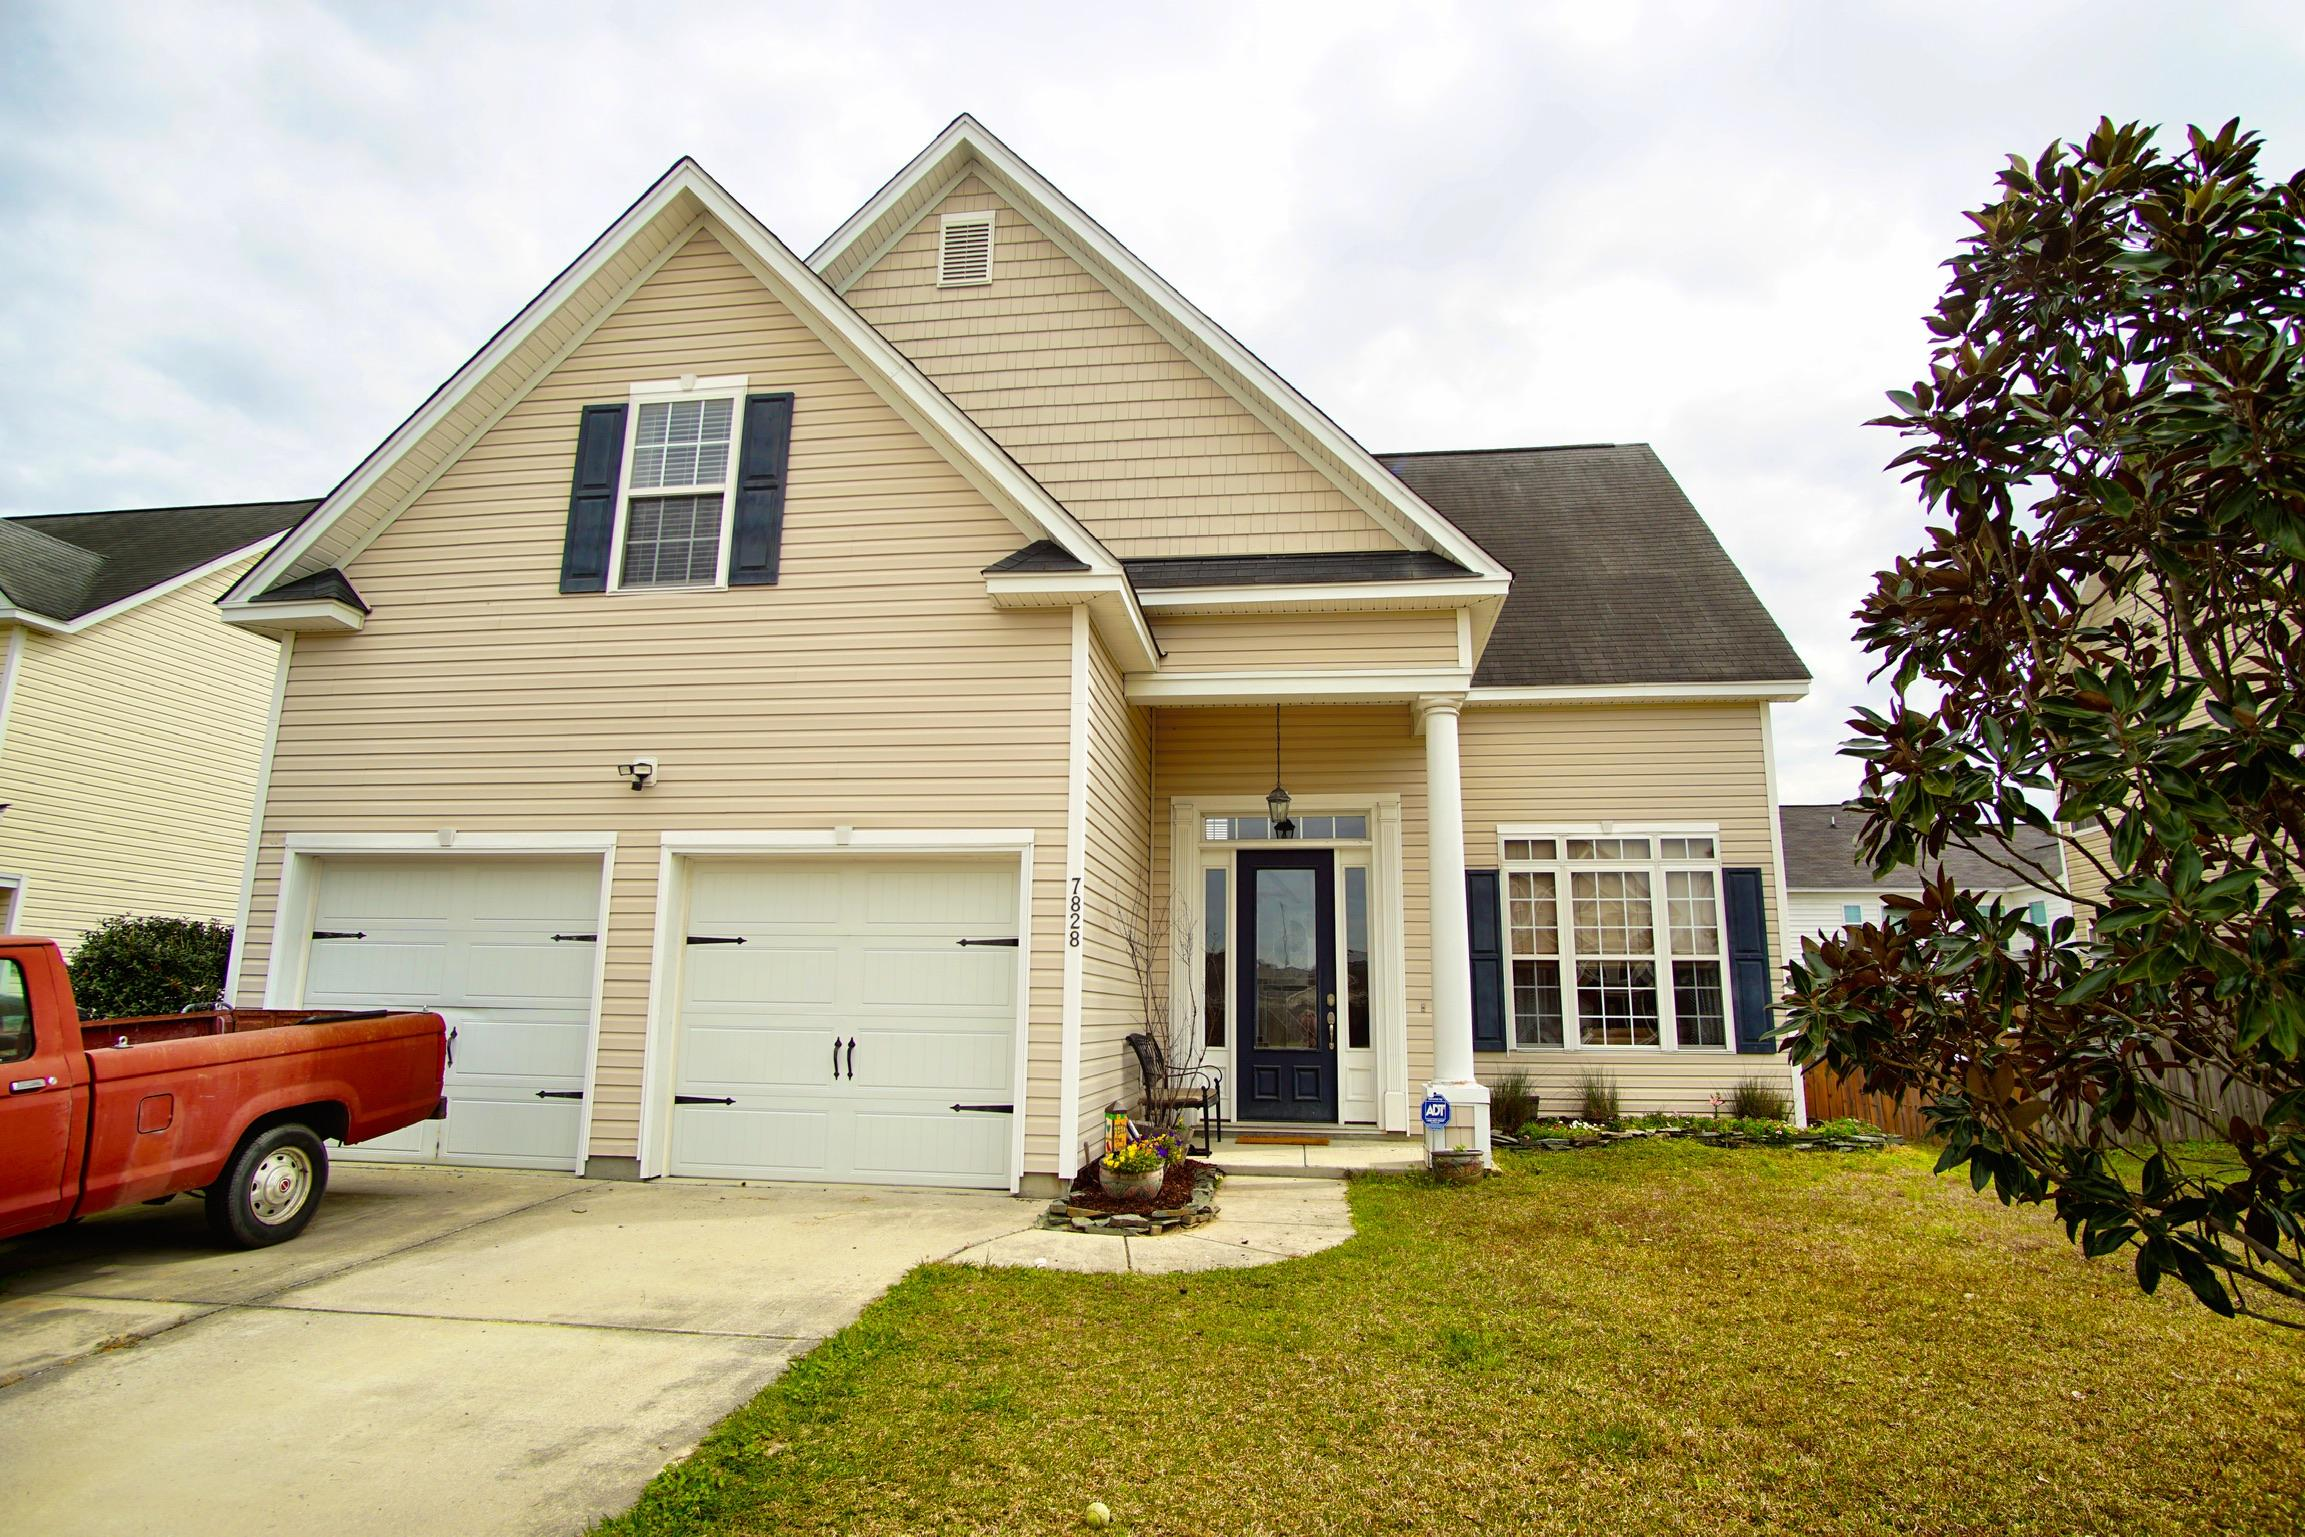 Colony North II Homes For Sale - 7828 Magellan, North Charleston, SC - 4